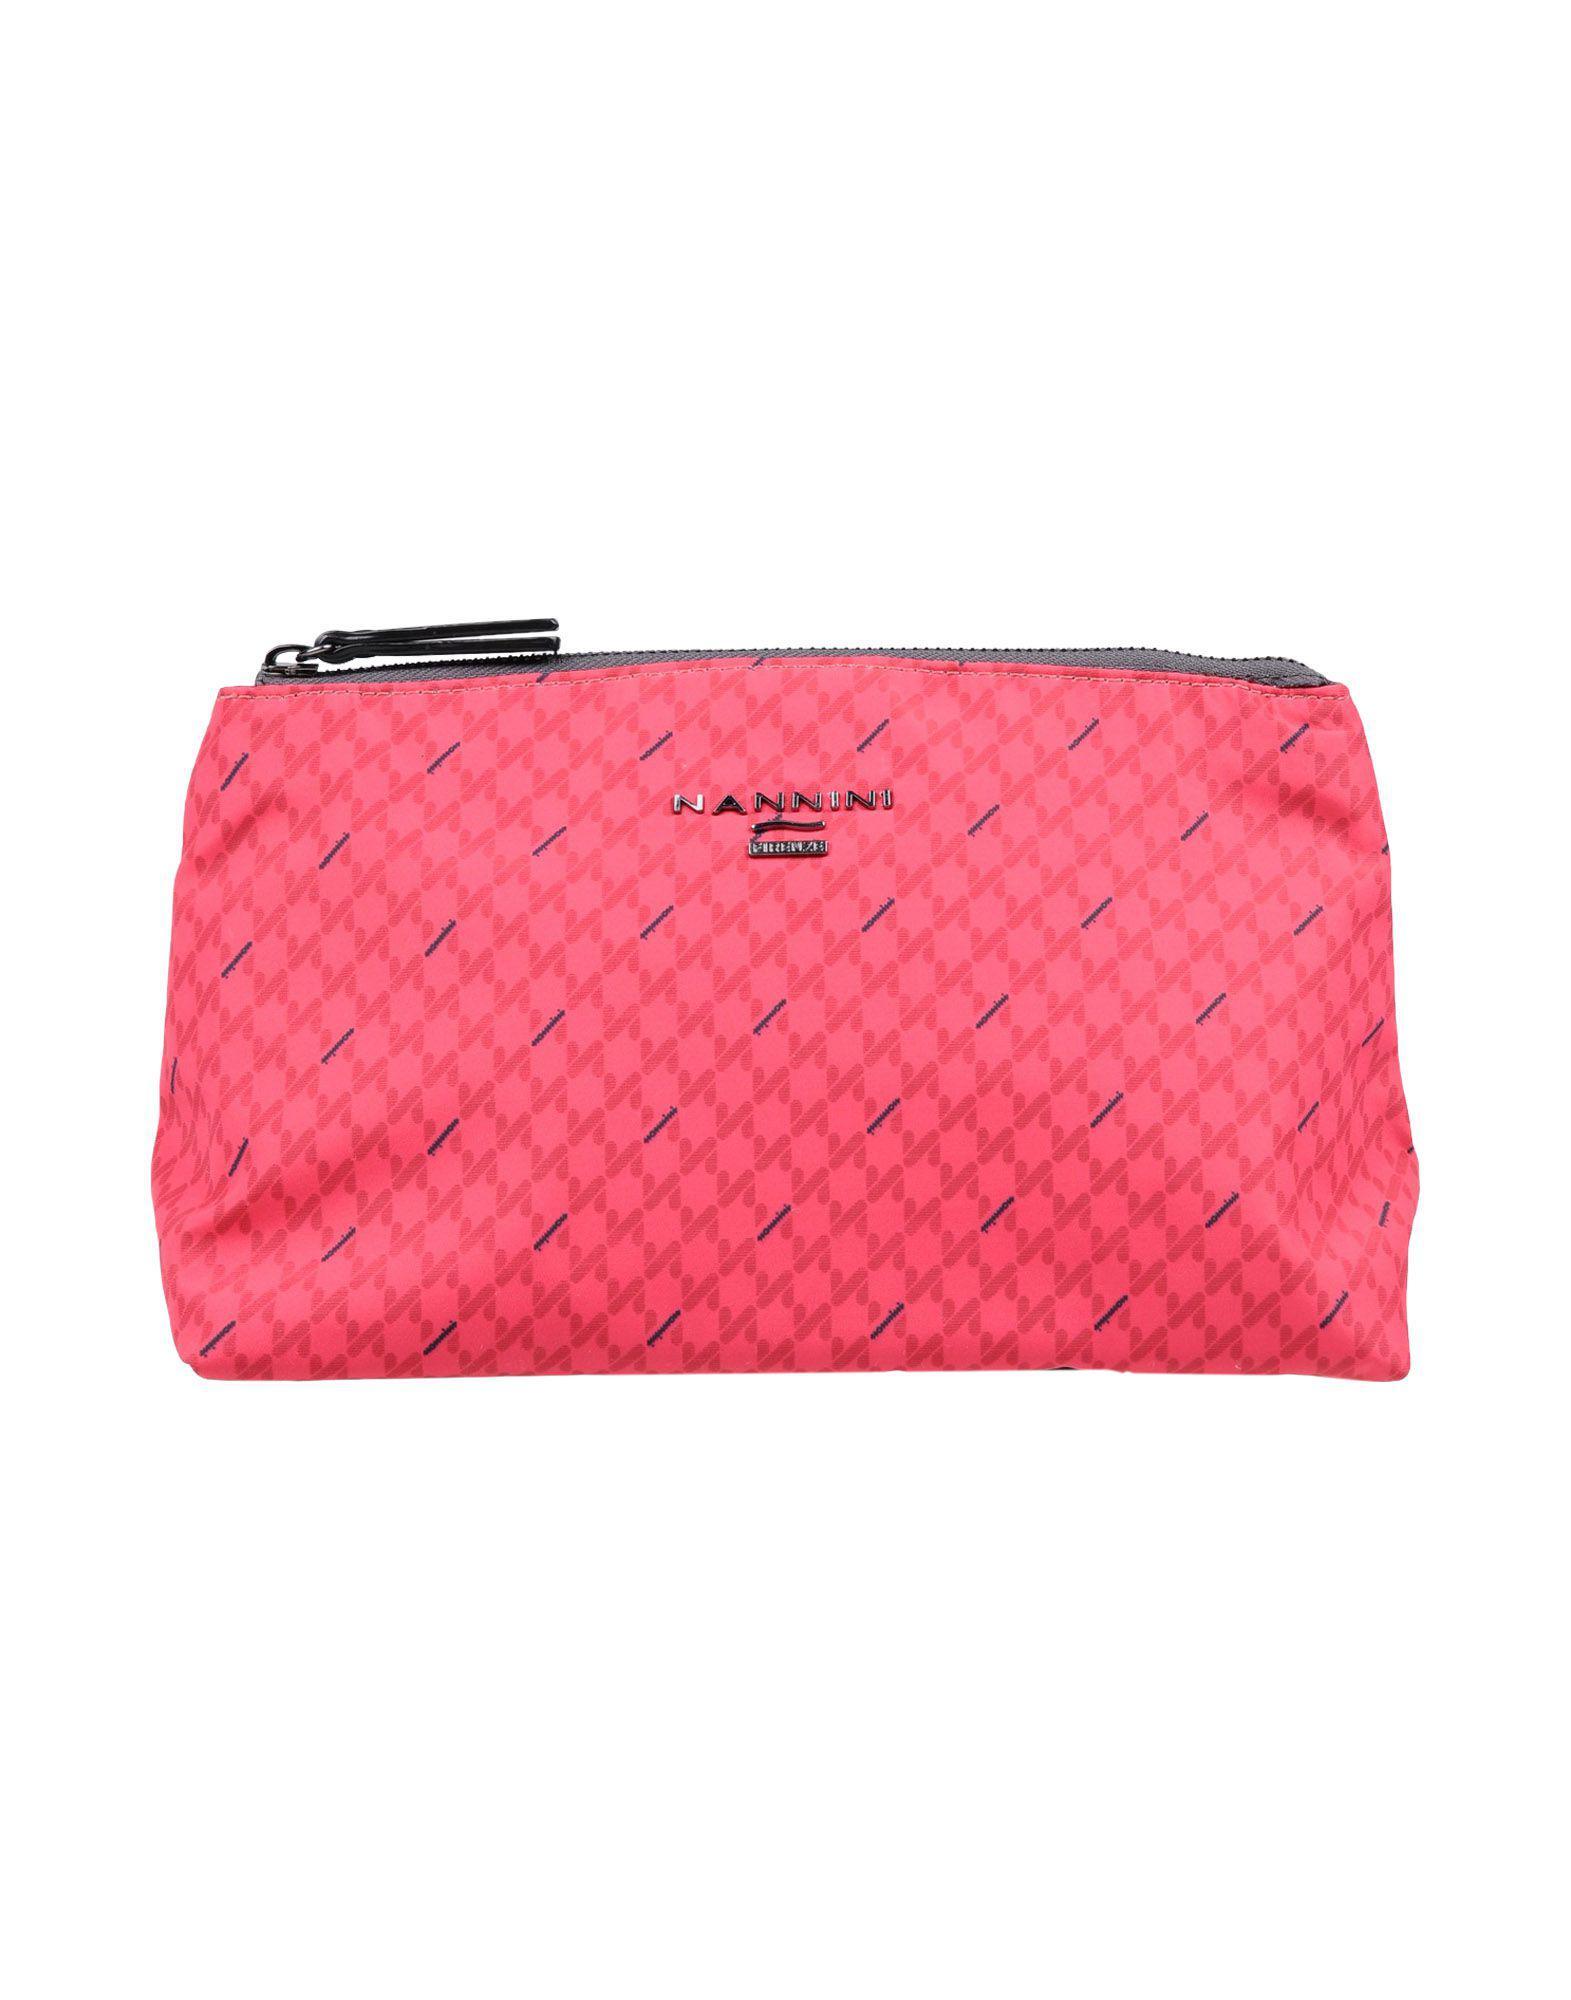 Nannini LUGGAGE - Beauty cases su YOOX.COM HalNGxN